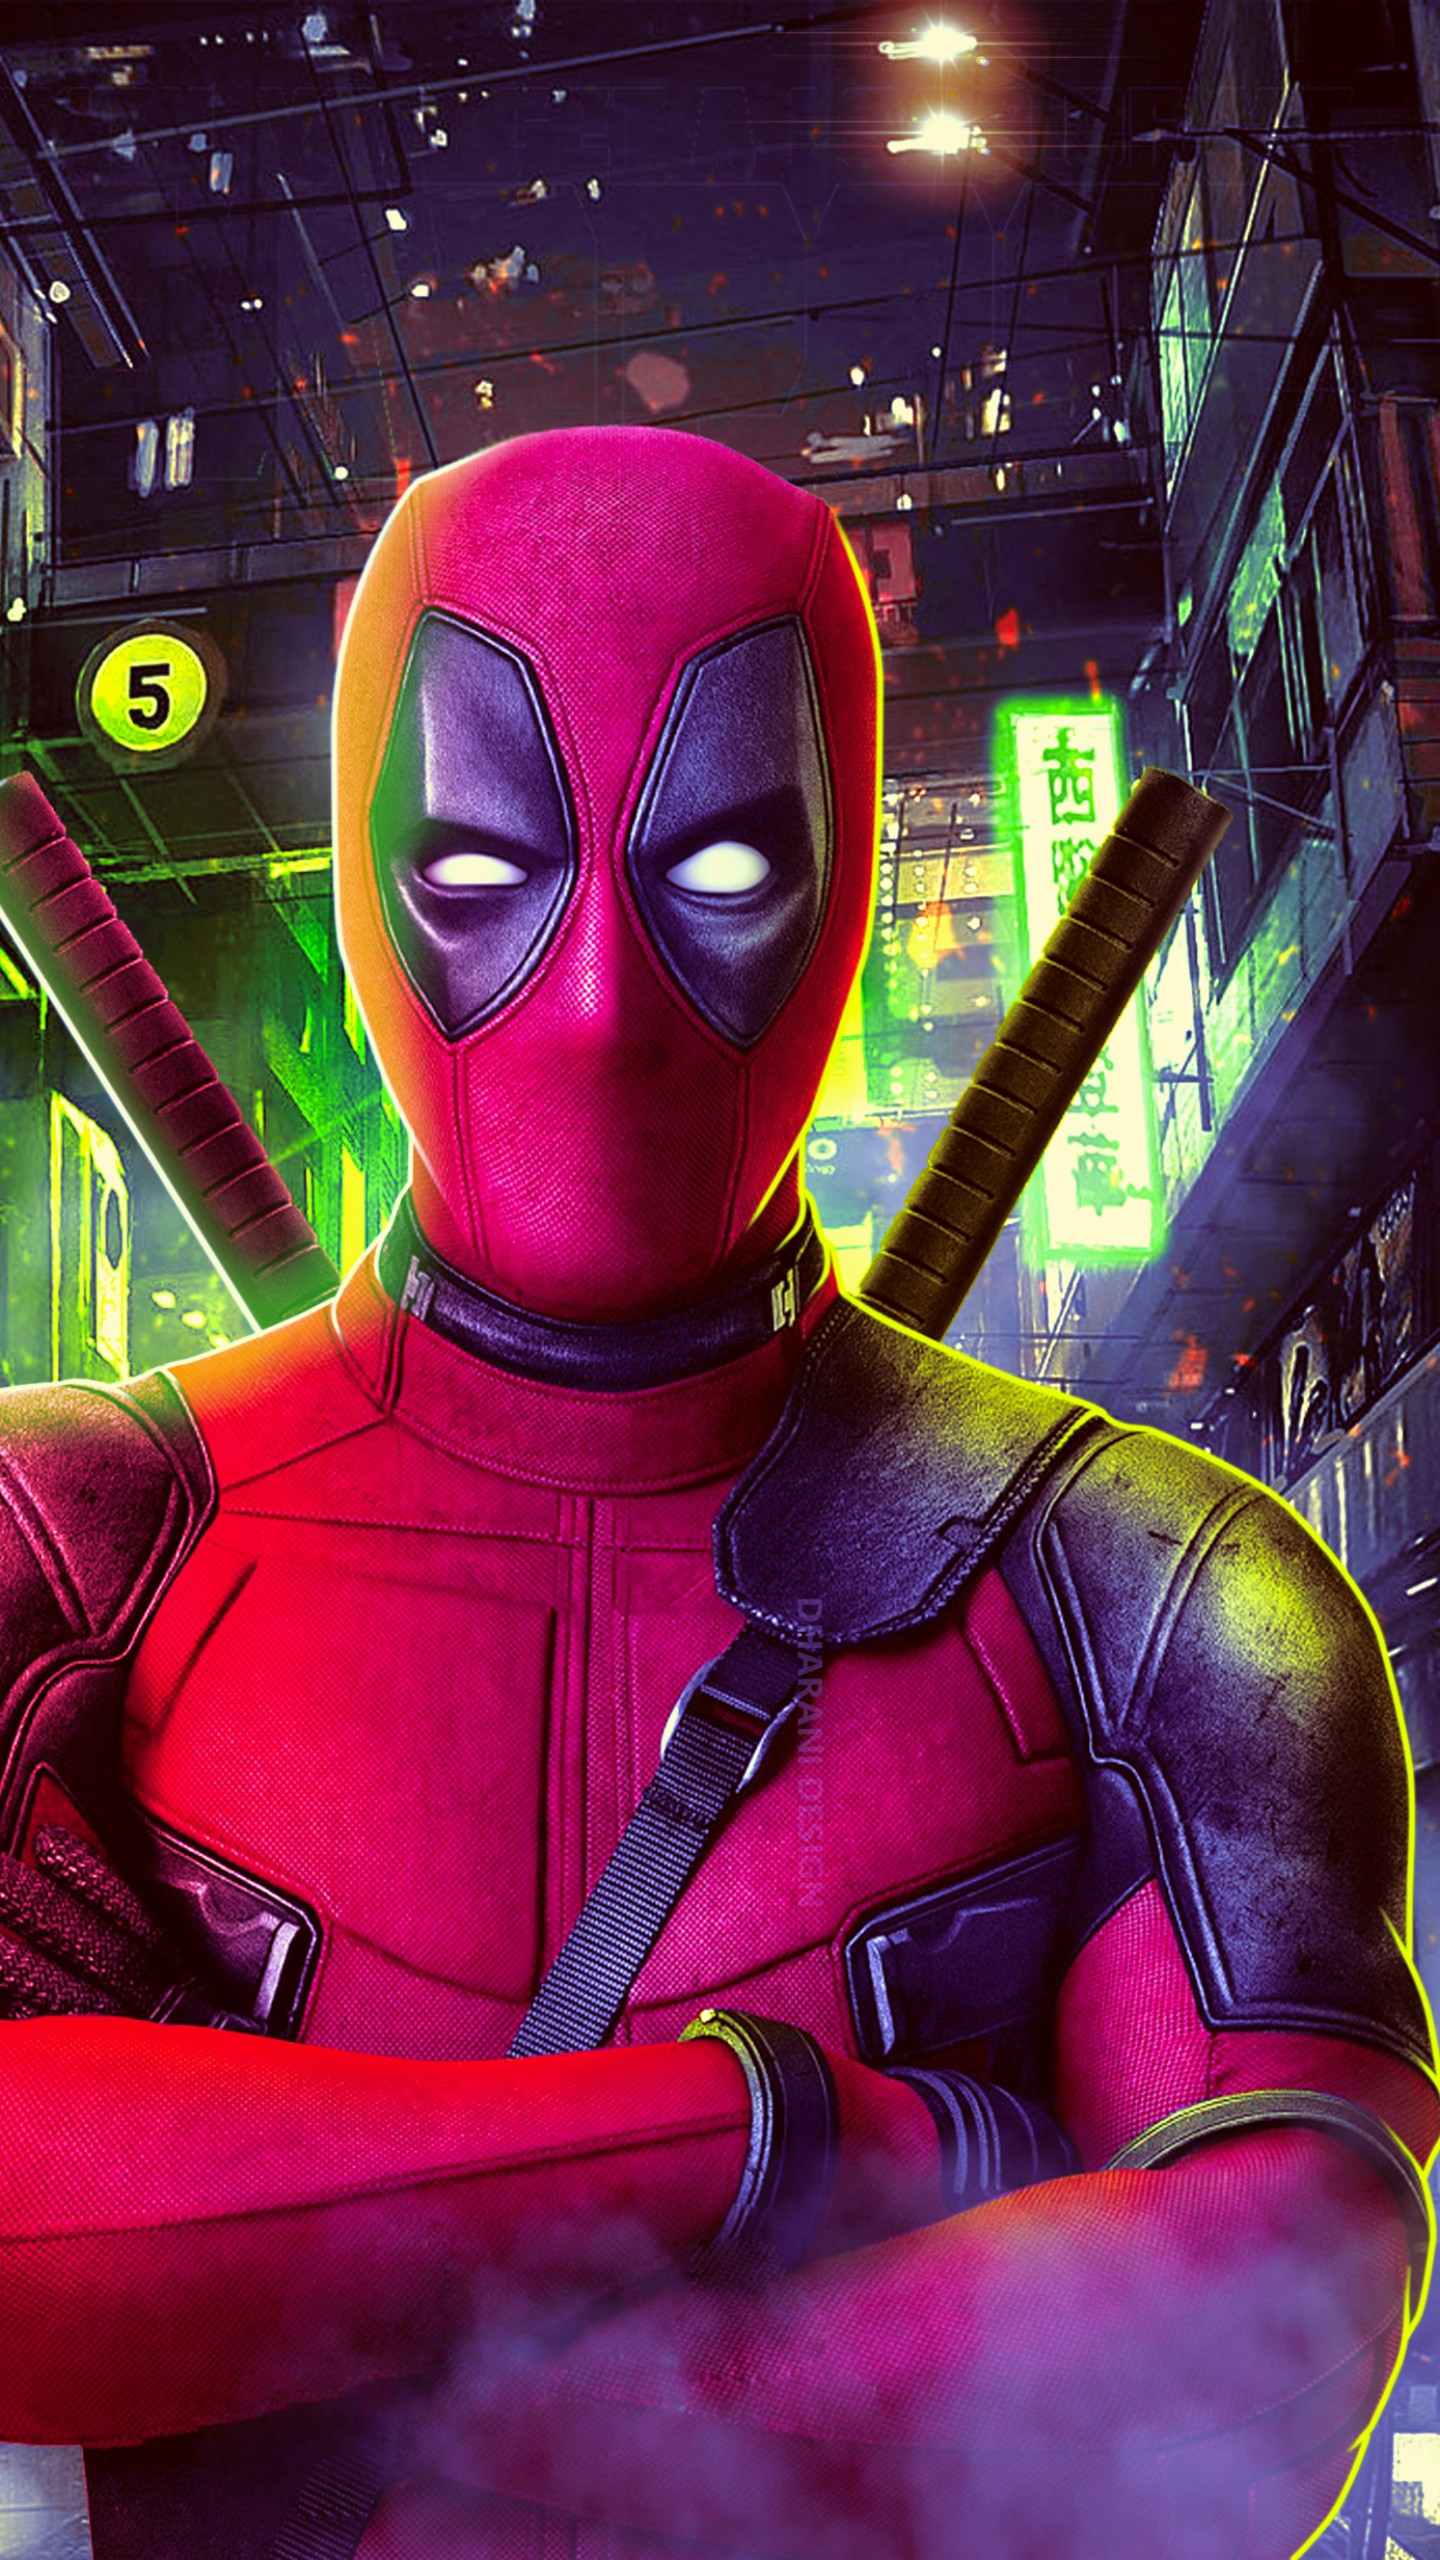 Deadpool Hd 4k Wallpaper Deadpool Wallpaper Hd 4k 1080x1920 Download Hd Wallpaper Wallpapertip